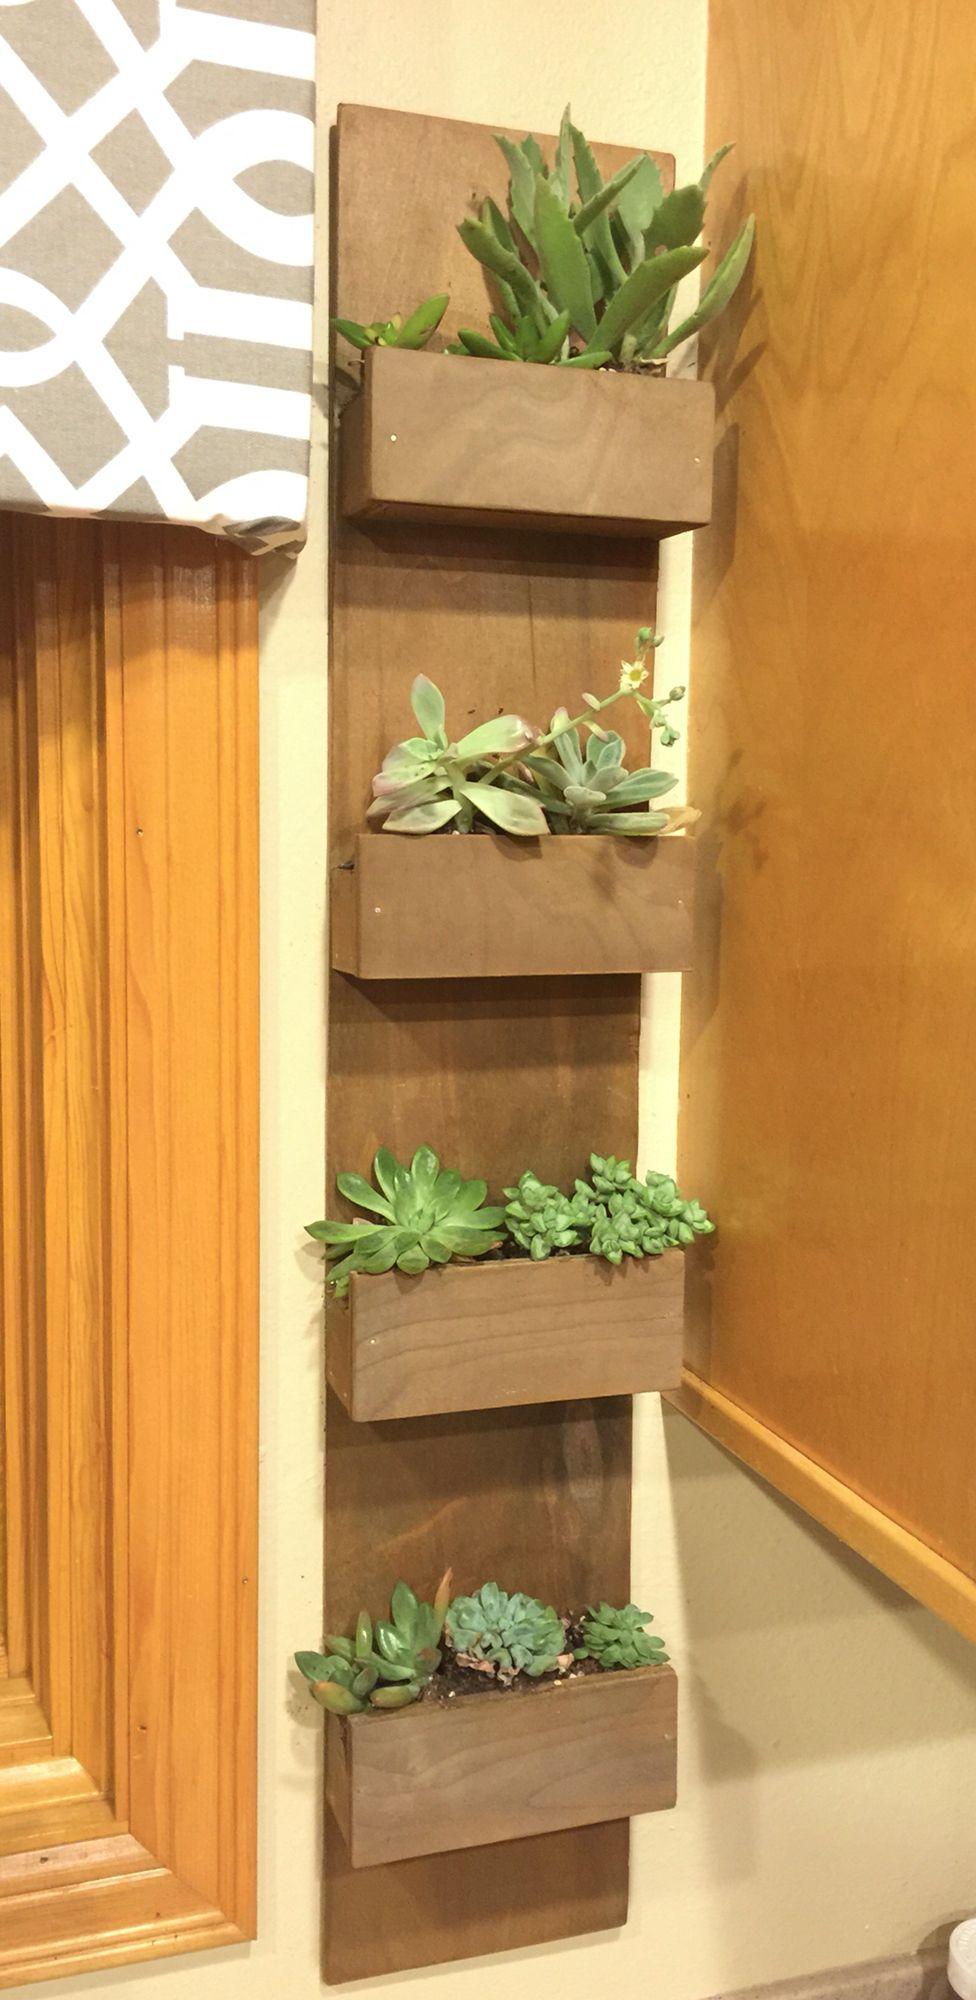 Diy hanging succulent garden wall home sweet home hanging succulents succulents garden - Indoor plant wall diy ...